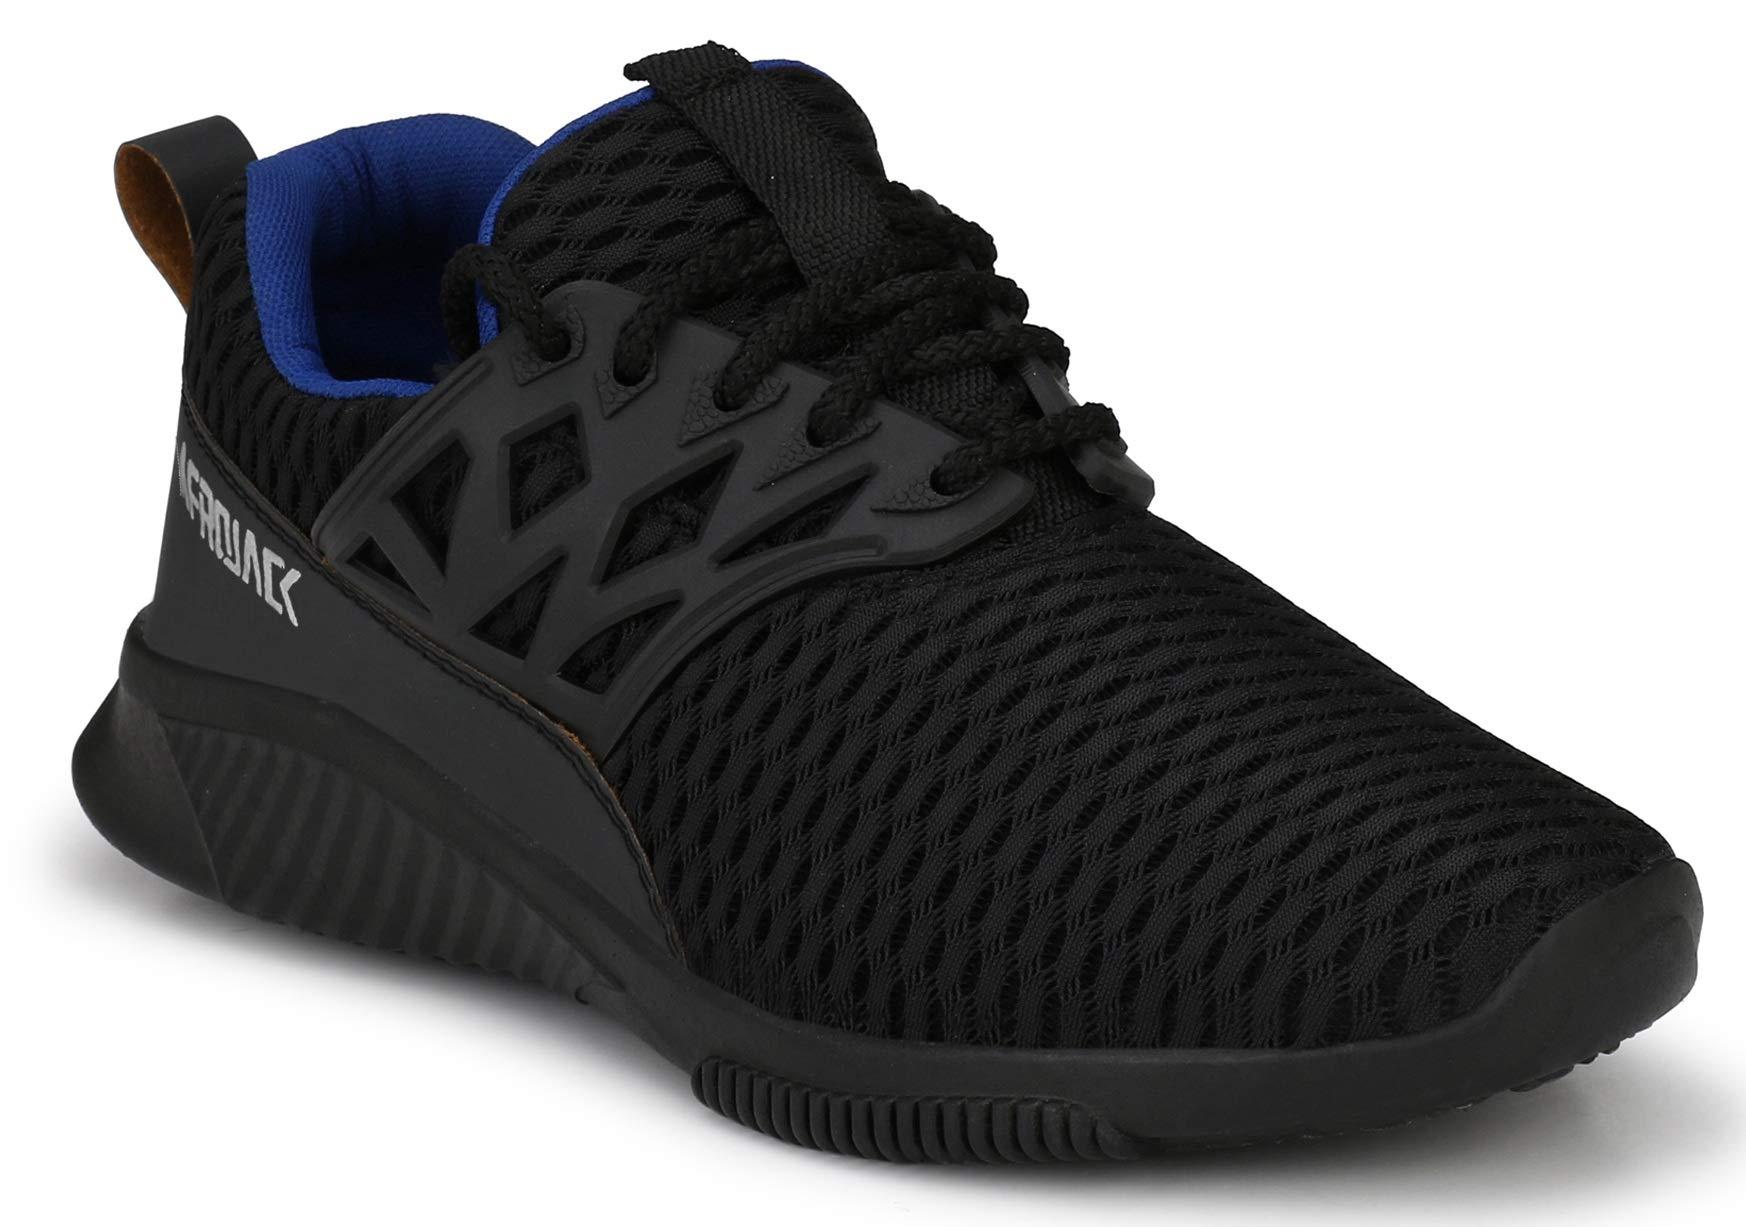 revendeur 971b3 90a0a Afrojack Men's Panther Series Mesh Running Shoes - Kota Footwear